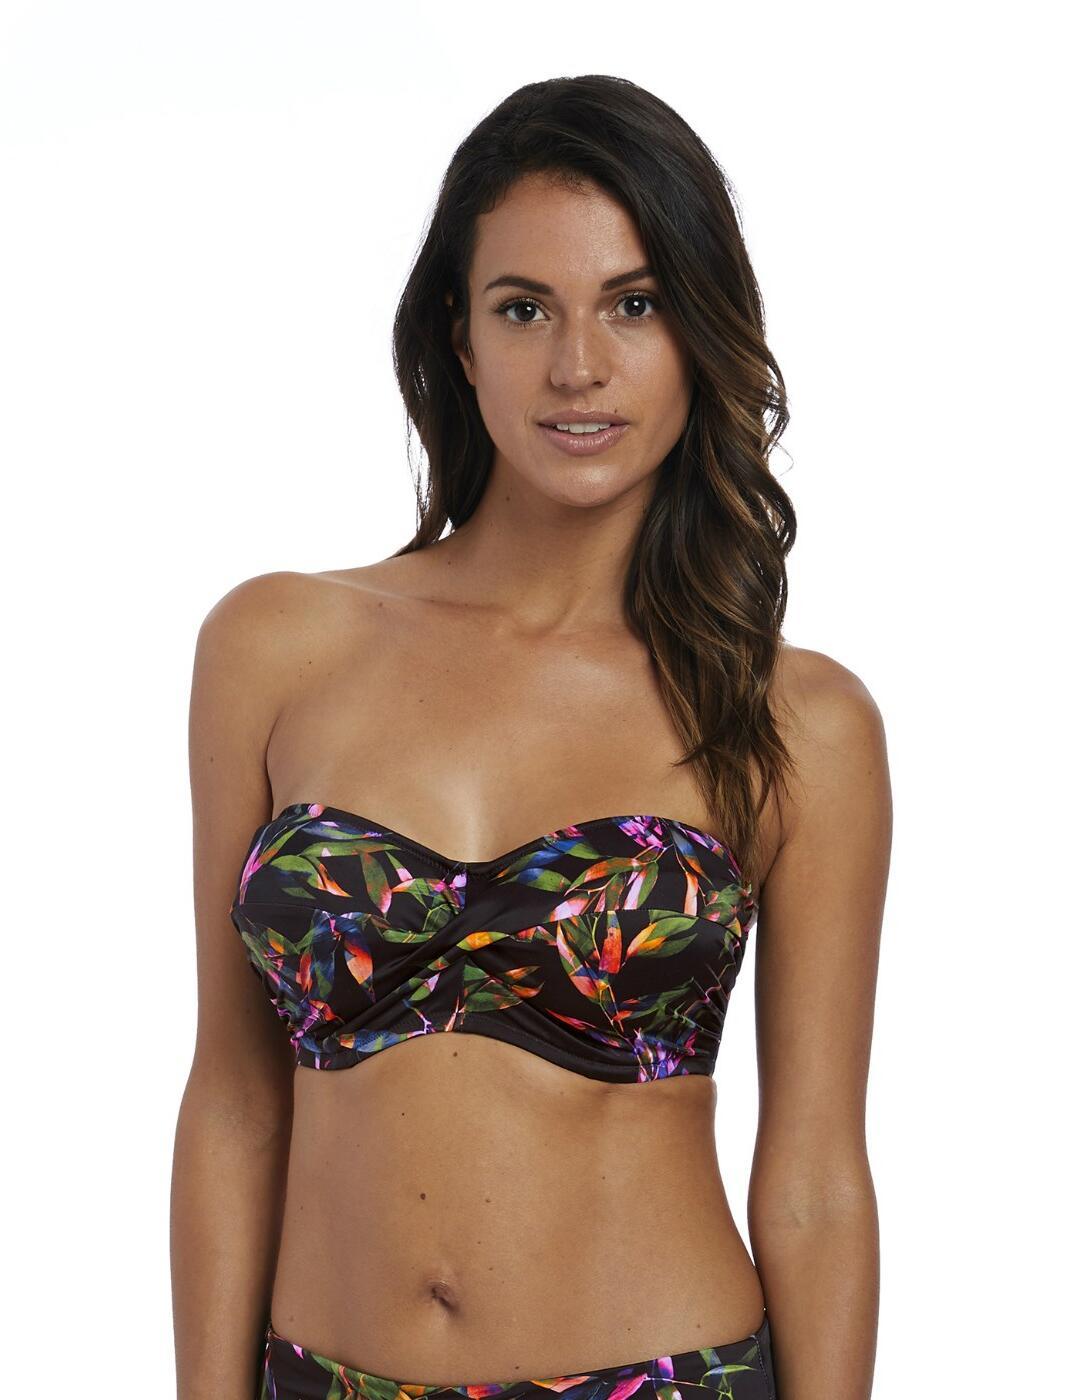 6612 Fantasie Palawan Bandeau Scarf Tie Bikini Top - 6612 Black